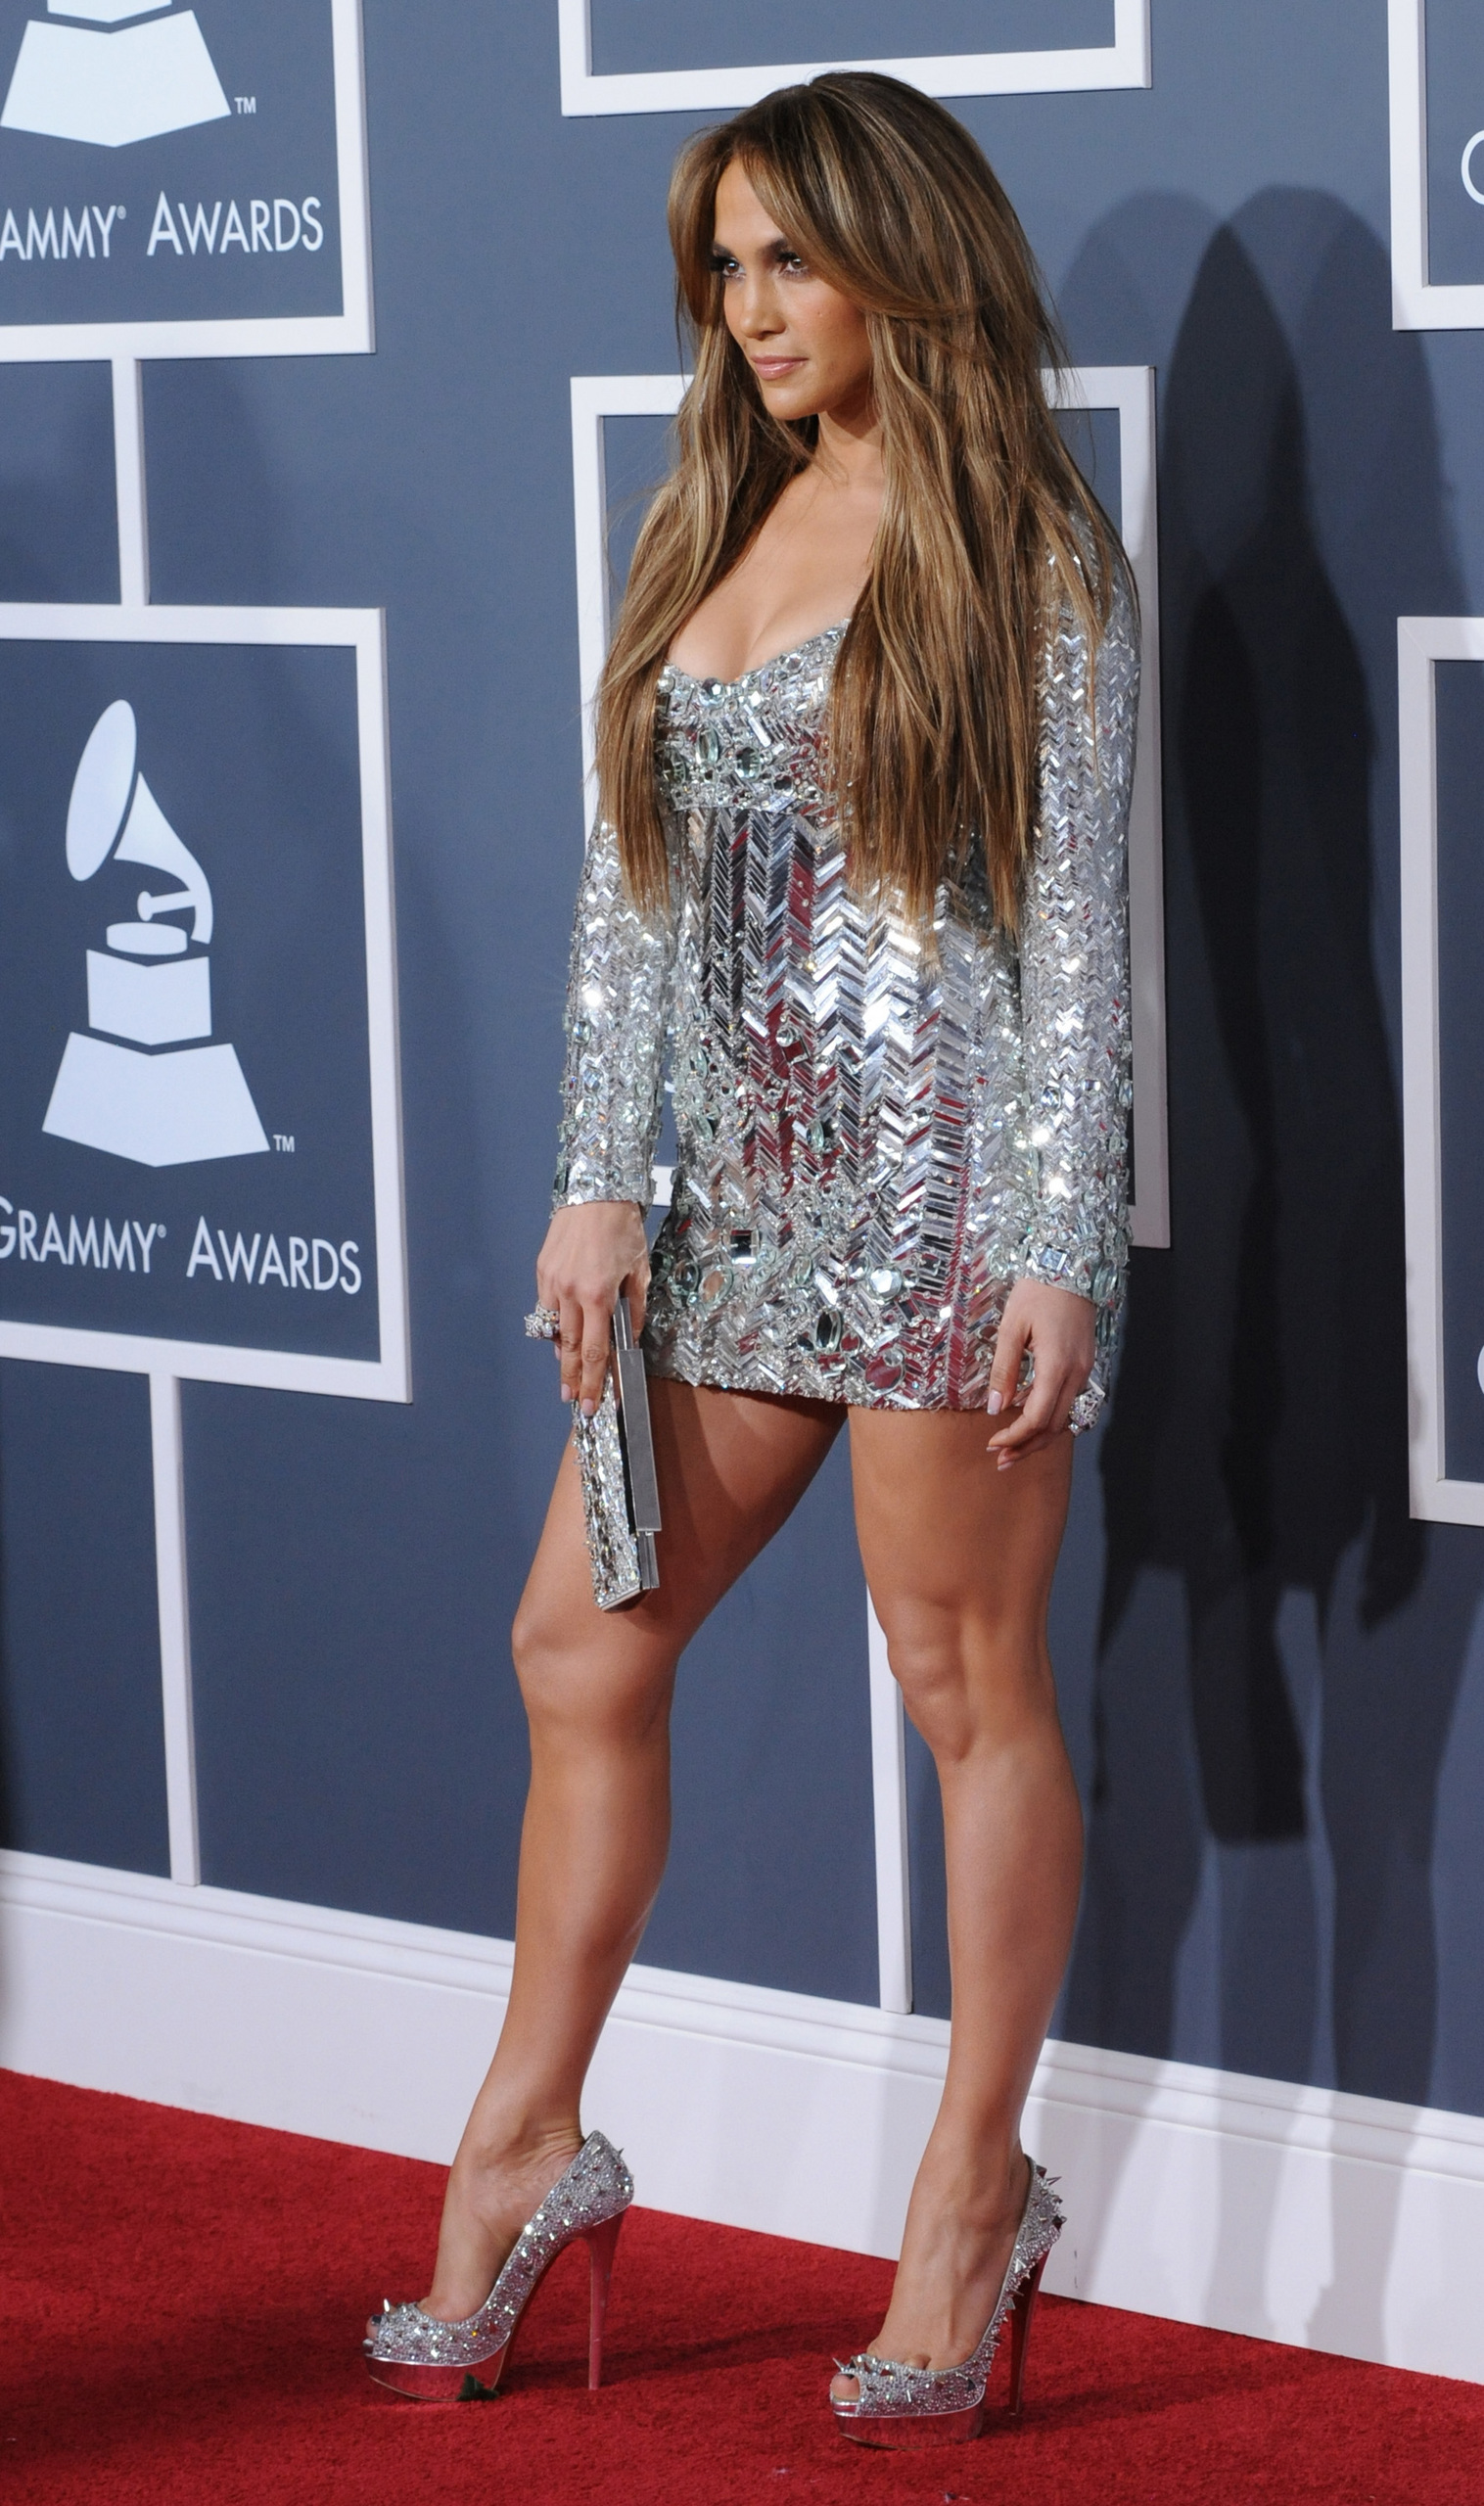 53rd Annual Grammy Awards 13 02 2011